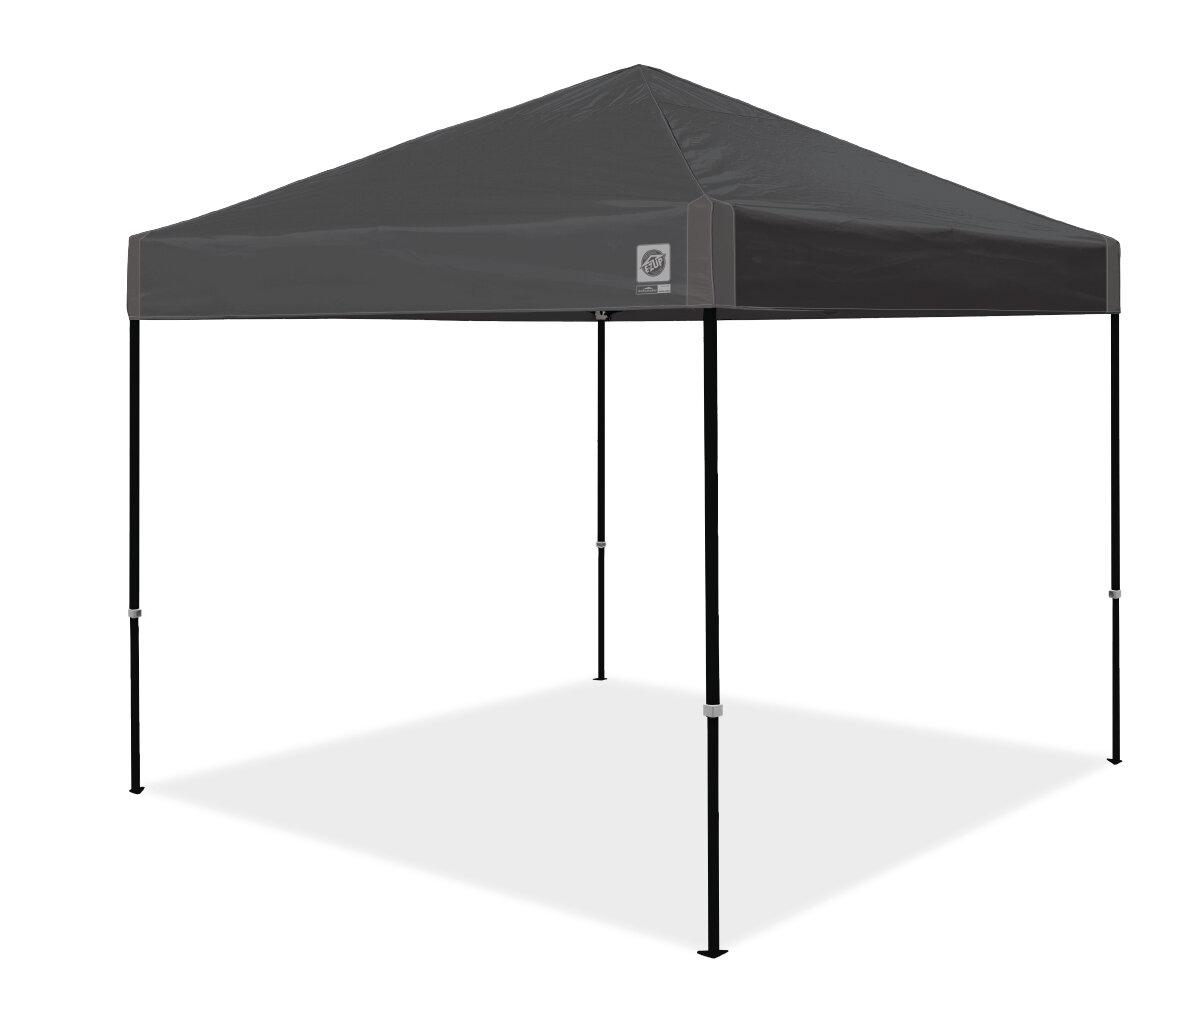 E Z Up Ambassador Instant Shelter 10 Ft W X 10 Ft D Metal Pop Up Canopy Reviews Wayfair